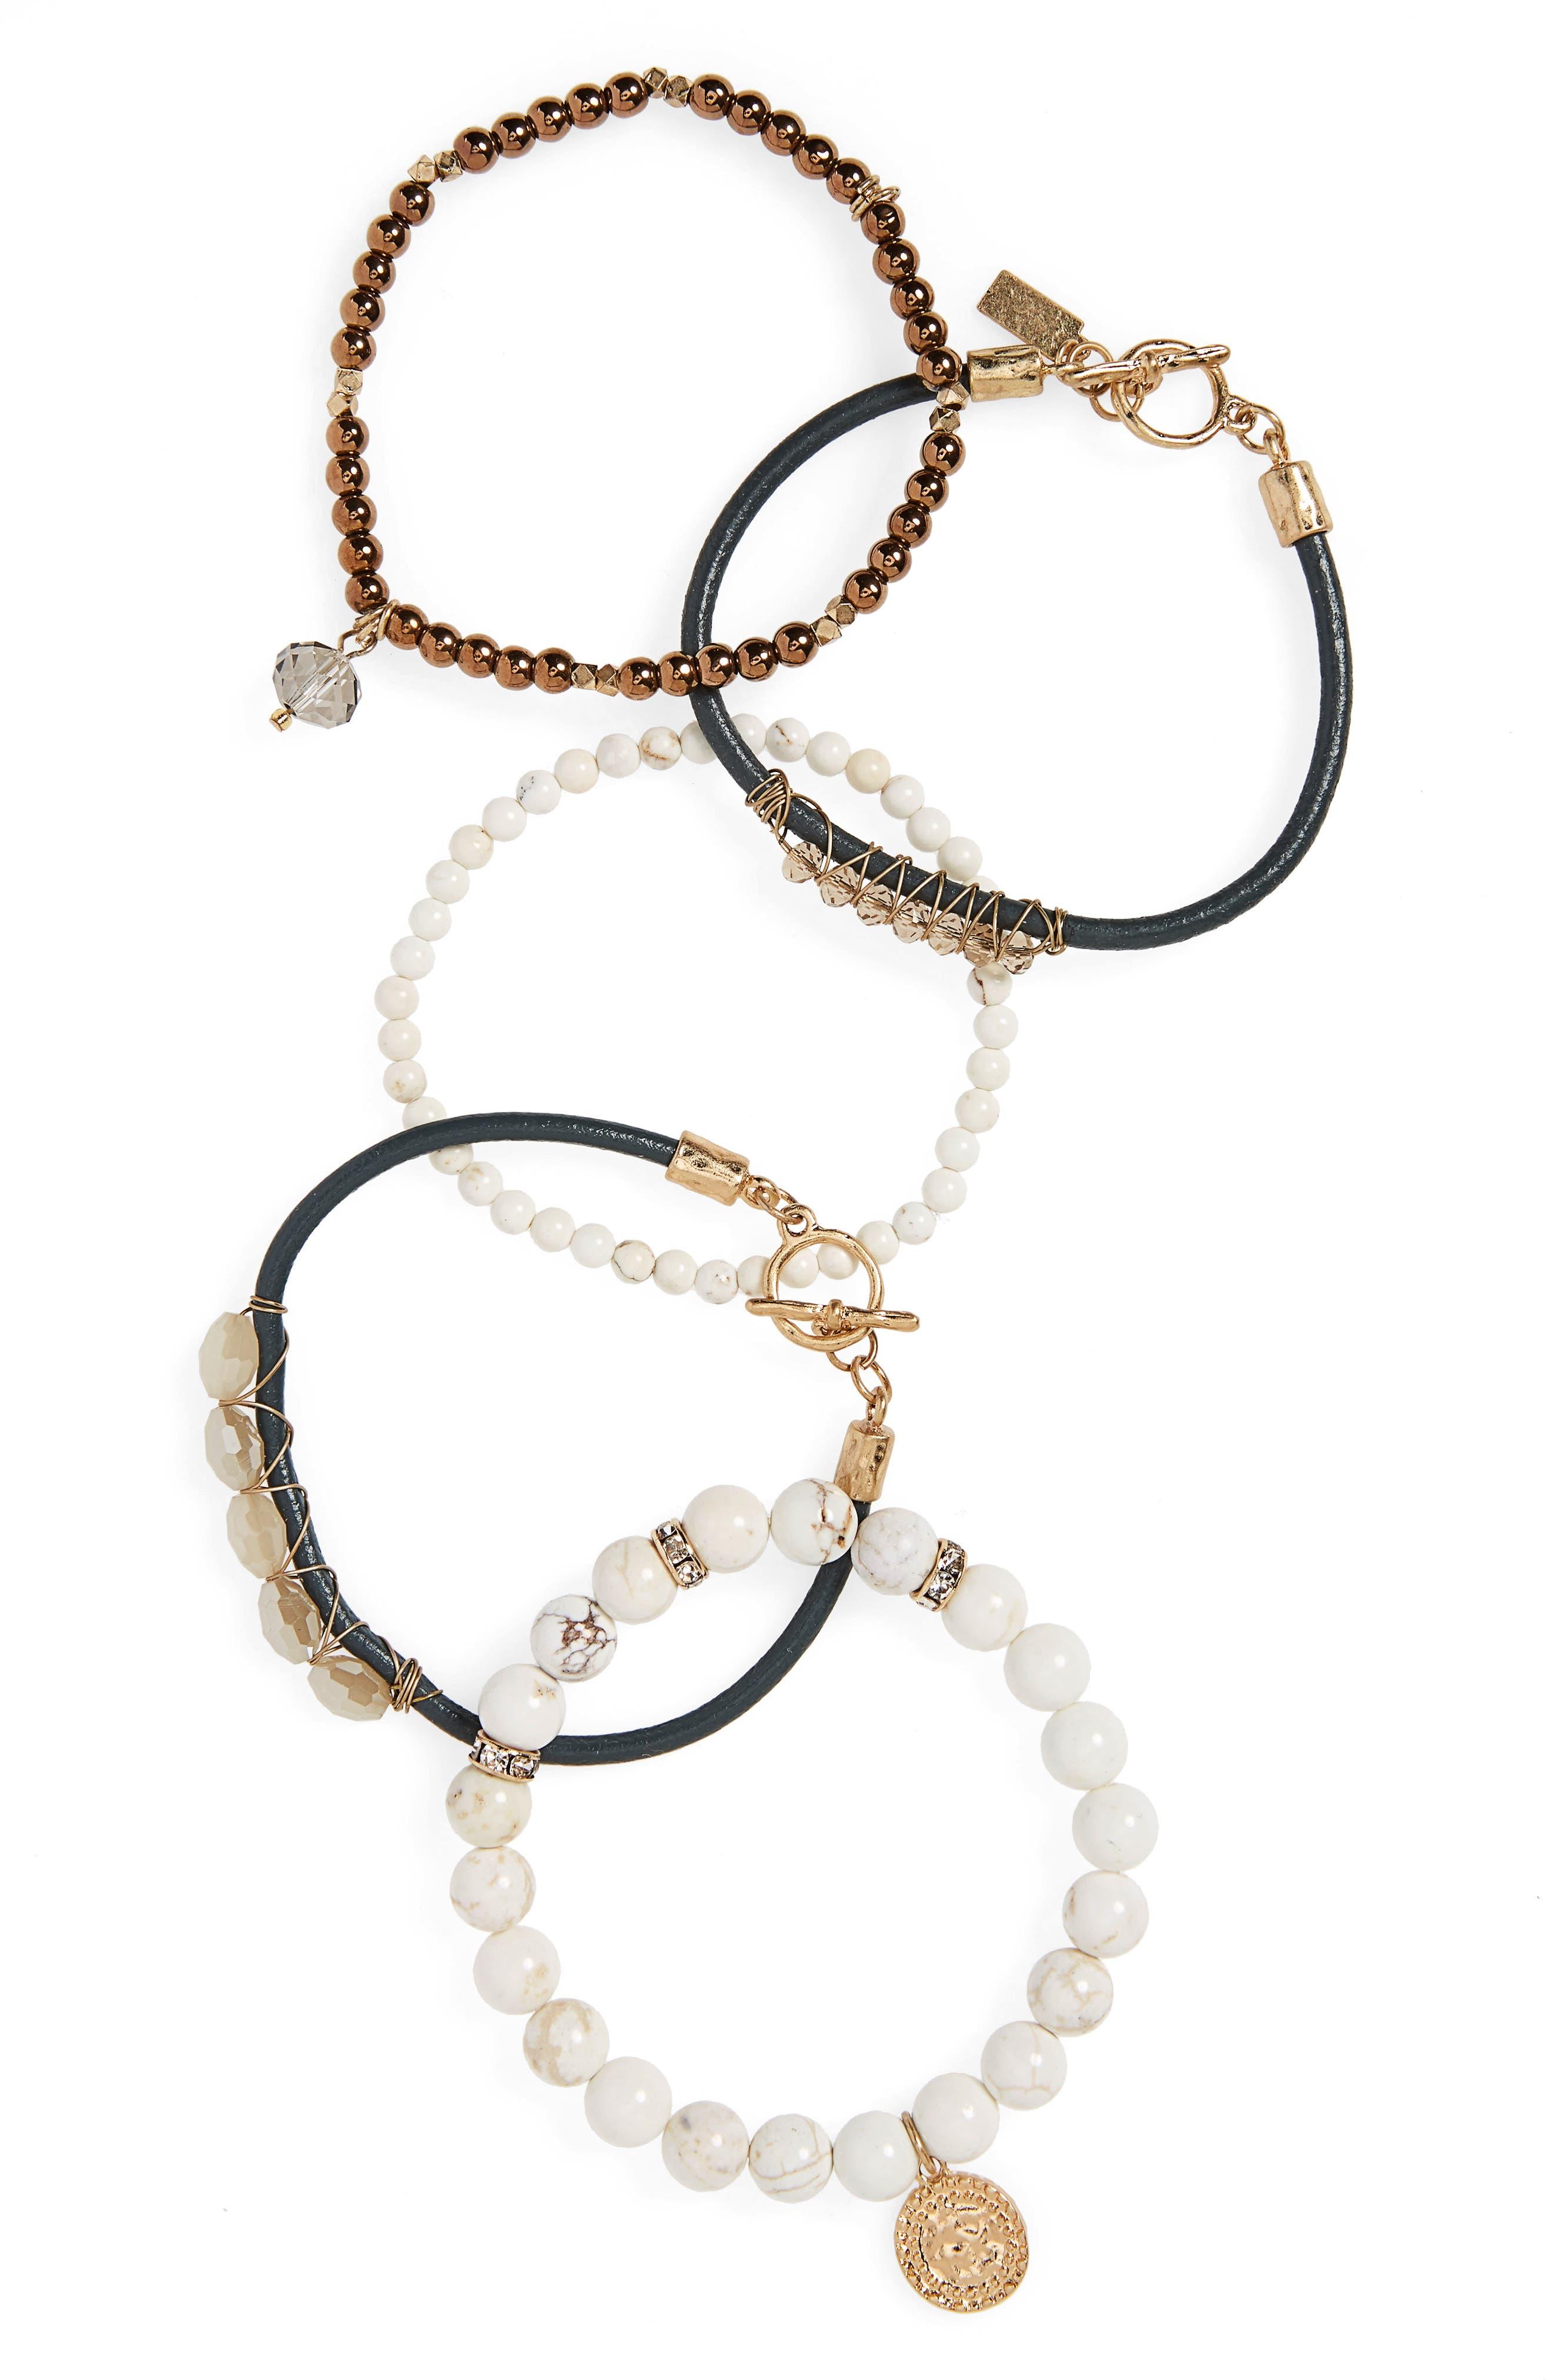 CANVAS JEWELRY 5-Piece Semiprecious Stone Stacking Bracelet, Main, color, 100